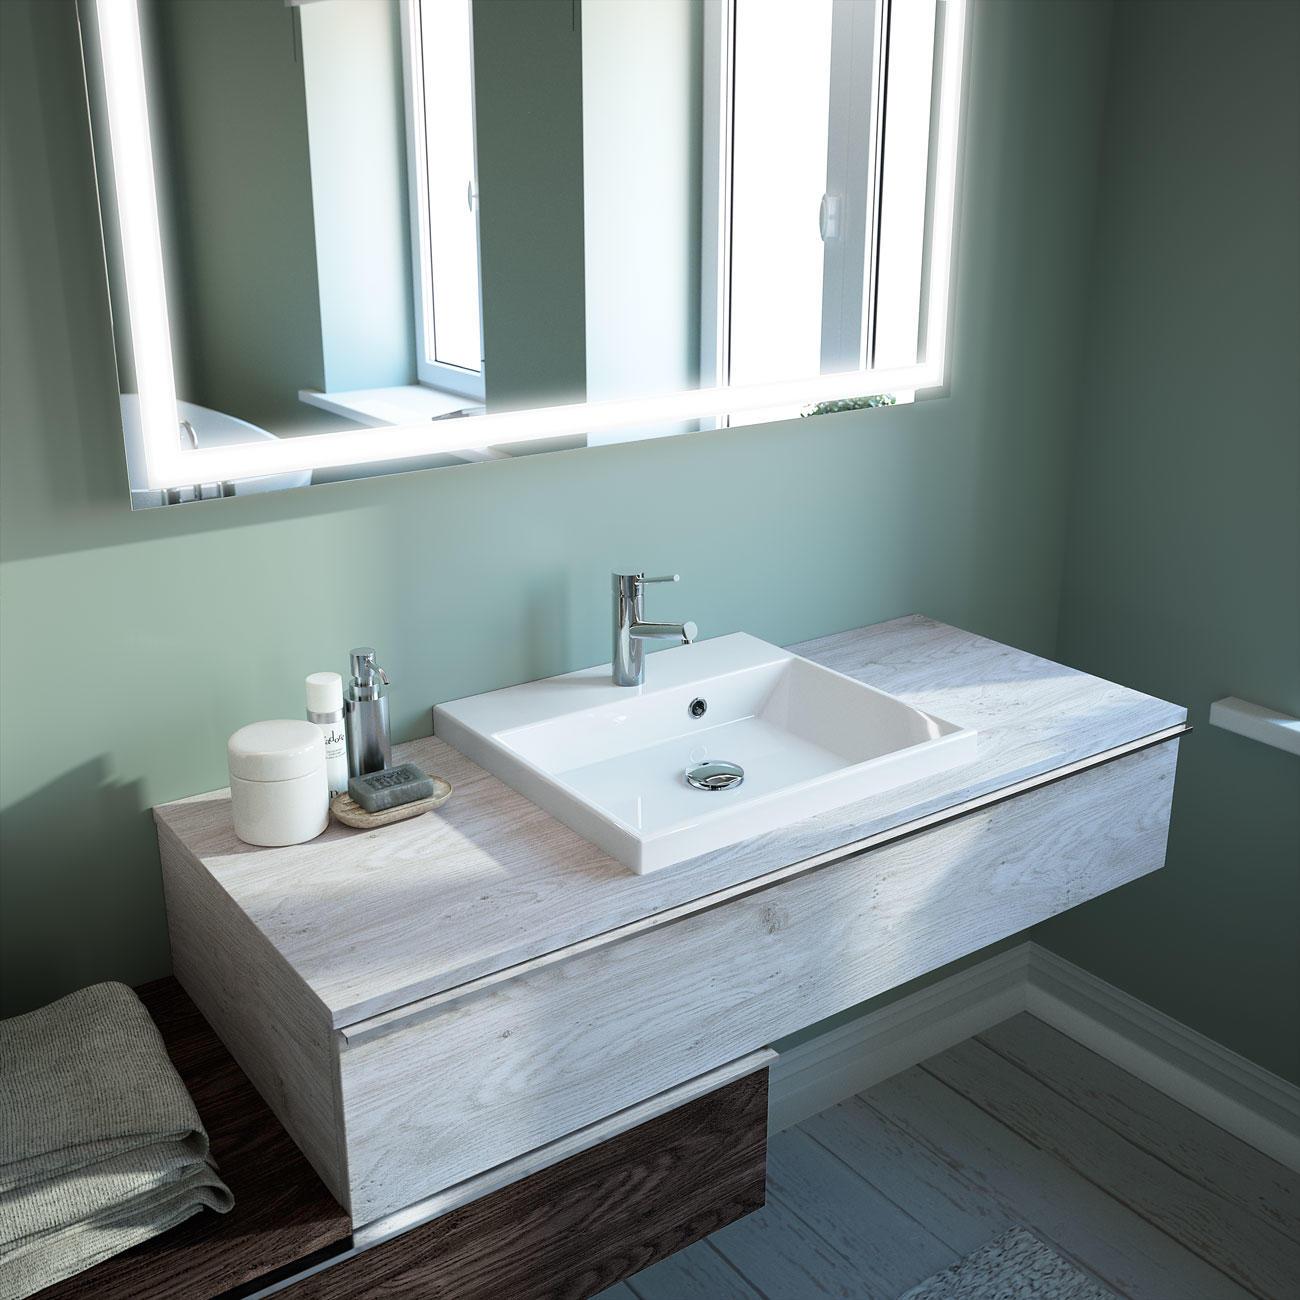 Plan de toilette fin + vasque  Meubles de salle de bains